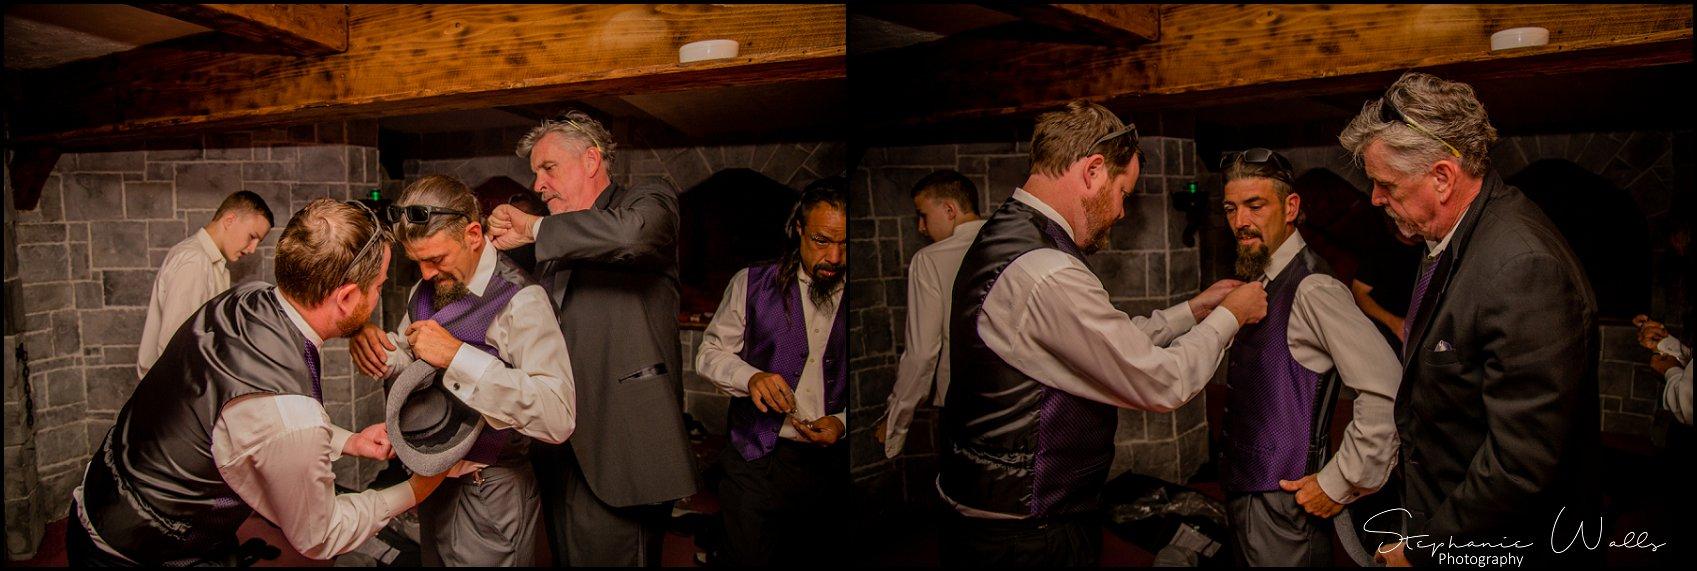 Everist Wedding 024 Patti & Bobbys | Troll Haven Castle & Bandy Farms | Sequim, Wa Wedding Photographer